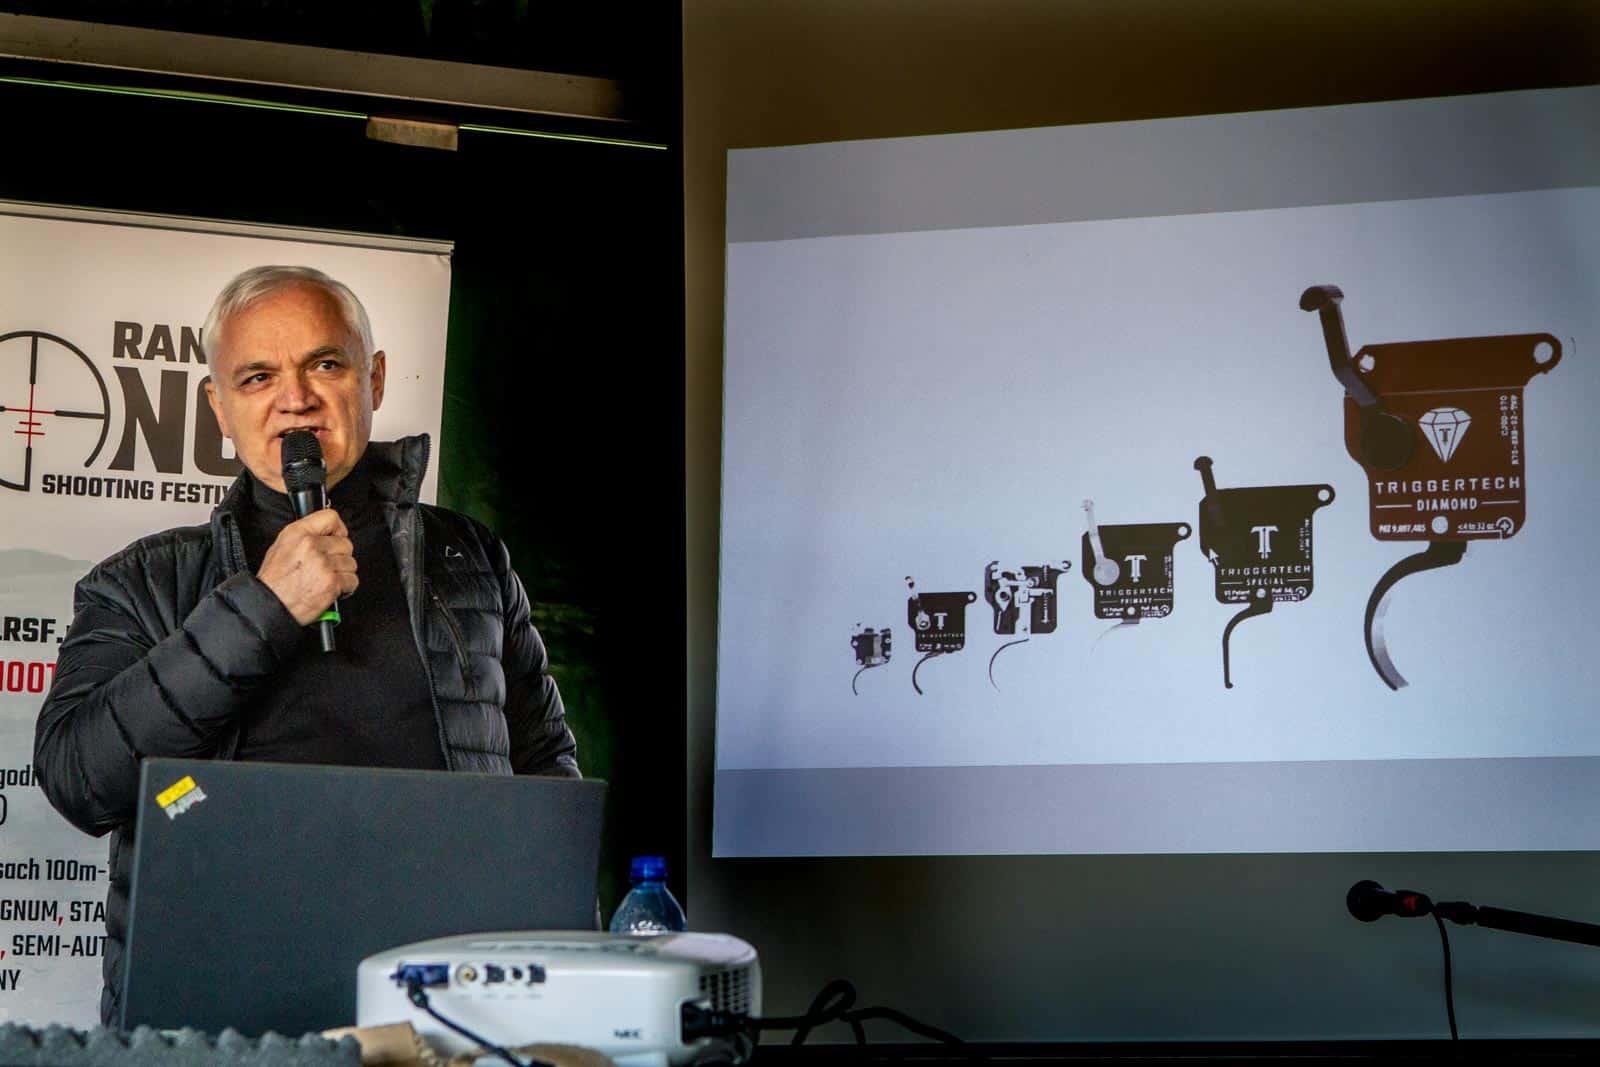 Greg Baniak prezentuje historie powstania spustu Rem 700 Diamond Trigger na Long Range Shooting Festival 2